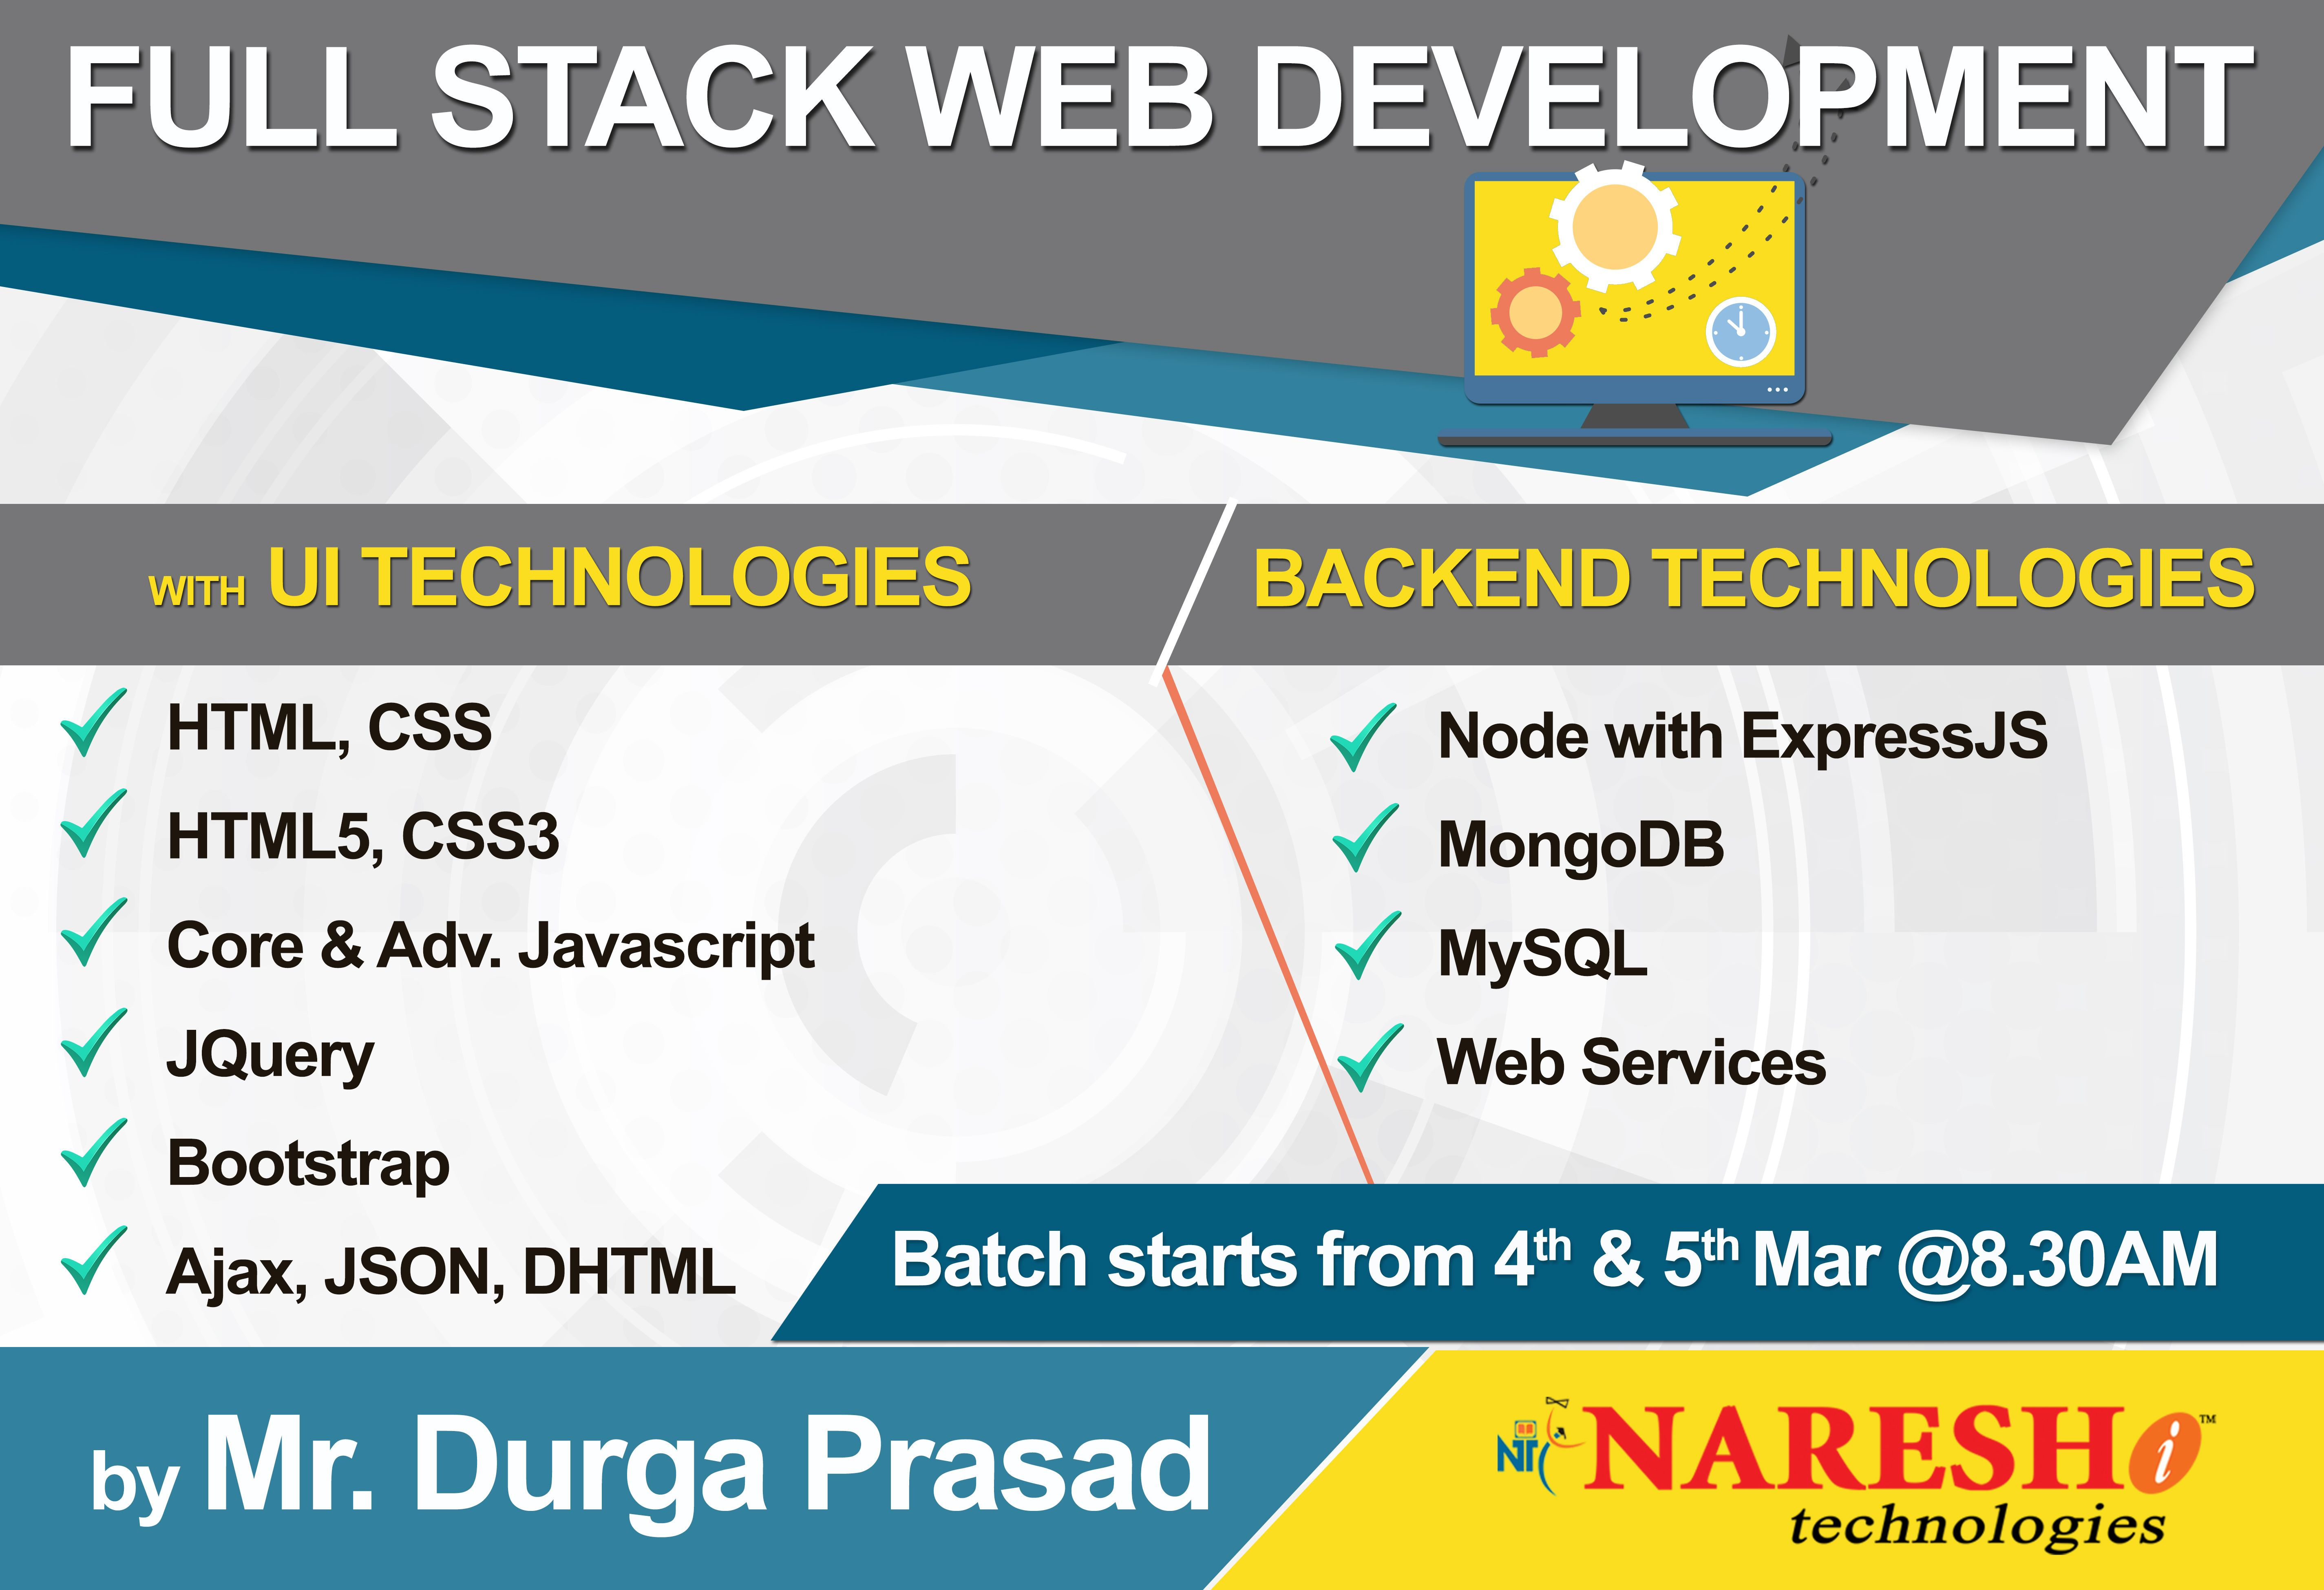 Attend Free Demo On Fullstack Web Development Training On 04th 5th March 8 30am By Mr Durgaprasad Web Development Training Full Stack Development